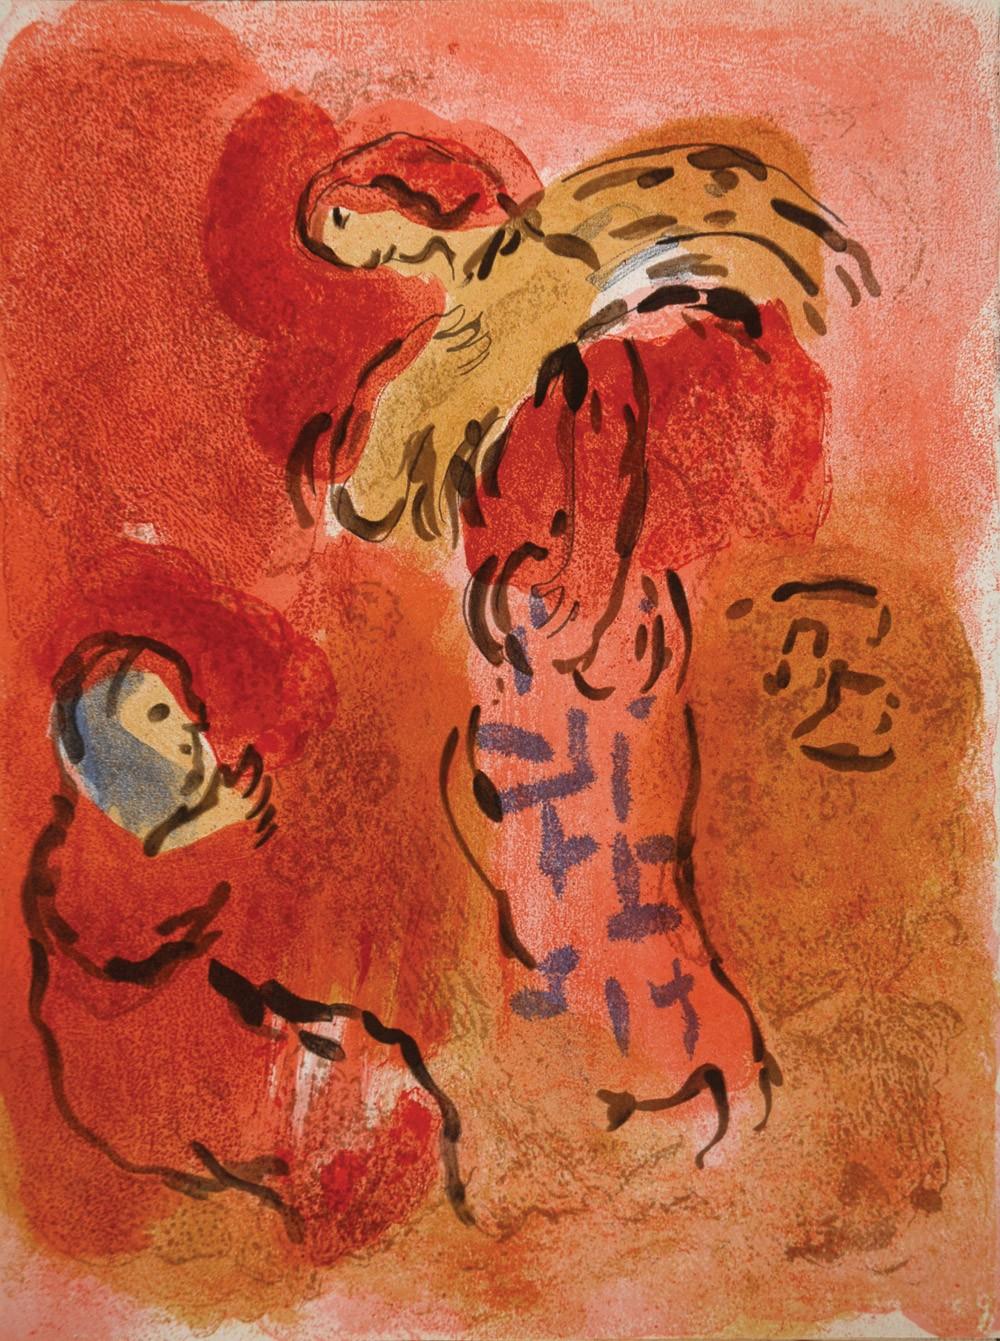 BERESHIT: God's last creation | Halakha of the Day Chagallbijbel